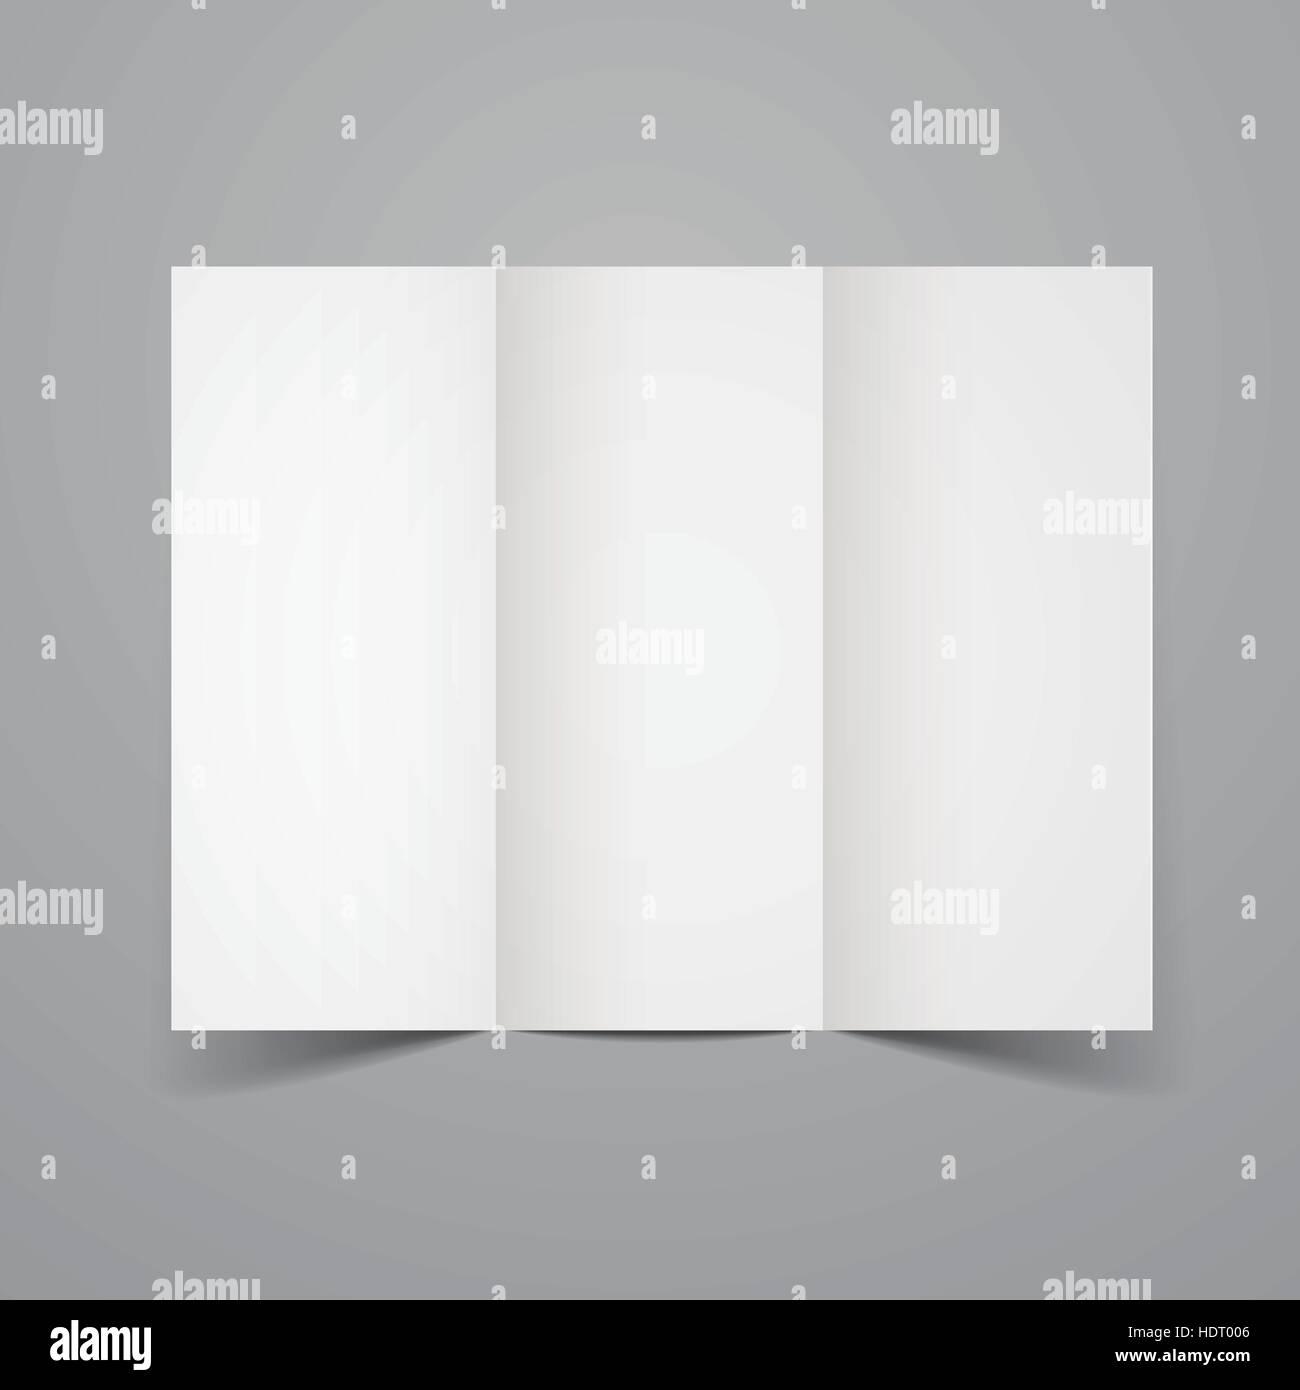 blank tri fold brochure design isolated on grey stock vector art